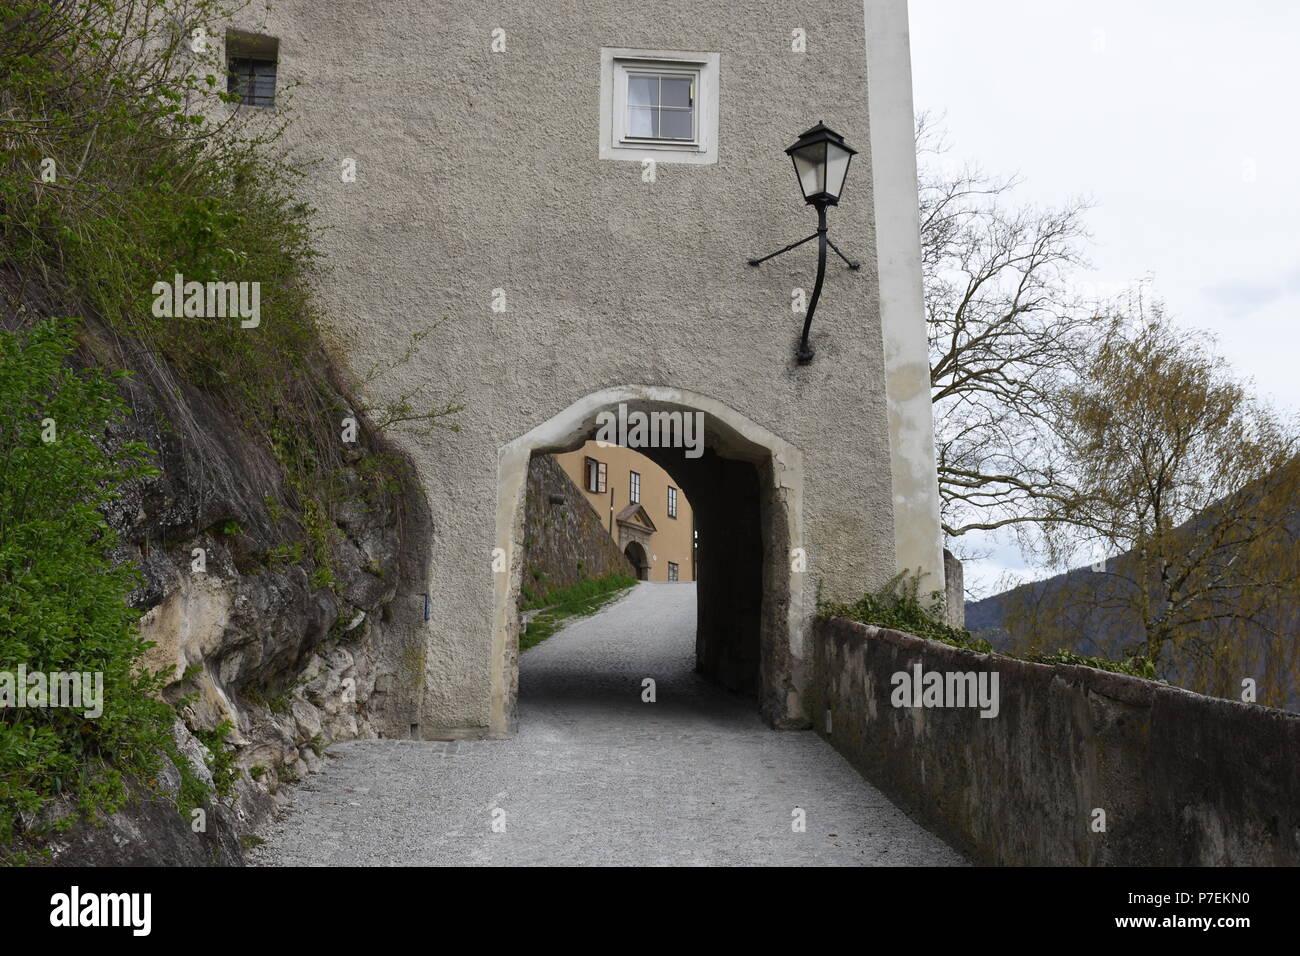 Salzburg, Mozart, Mozartstadt, Jedermann, Hohensalzburg, Burg, Mönchsberg, Kapuzinerberg, Festung, Mauer, Treppe, Stiege, Weg, Stufen, Kirche, Kirchtu - Stock Image